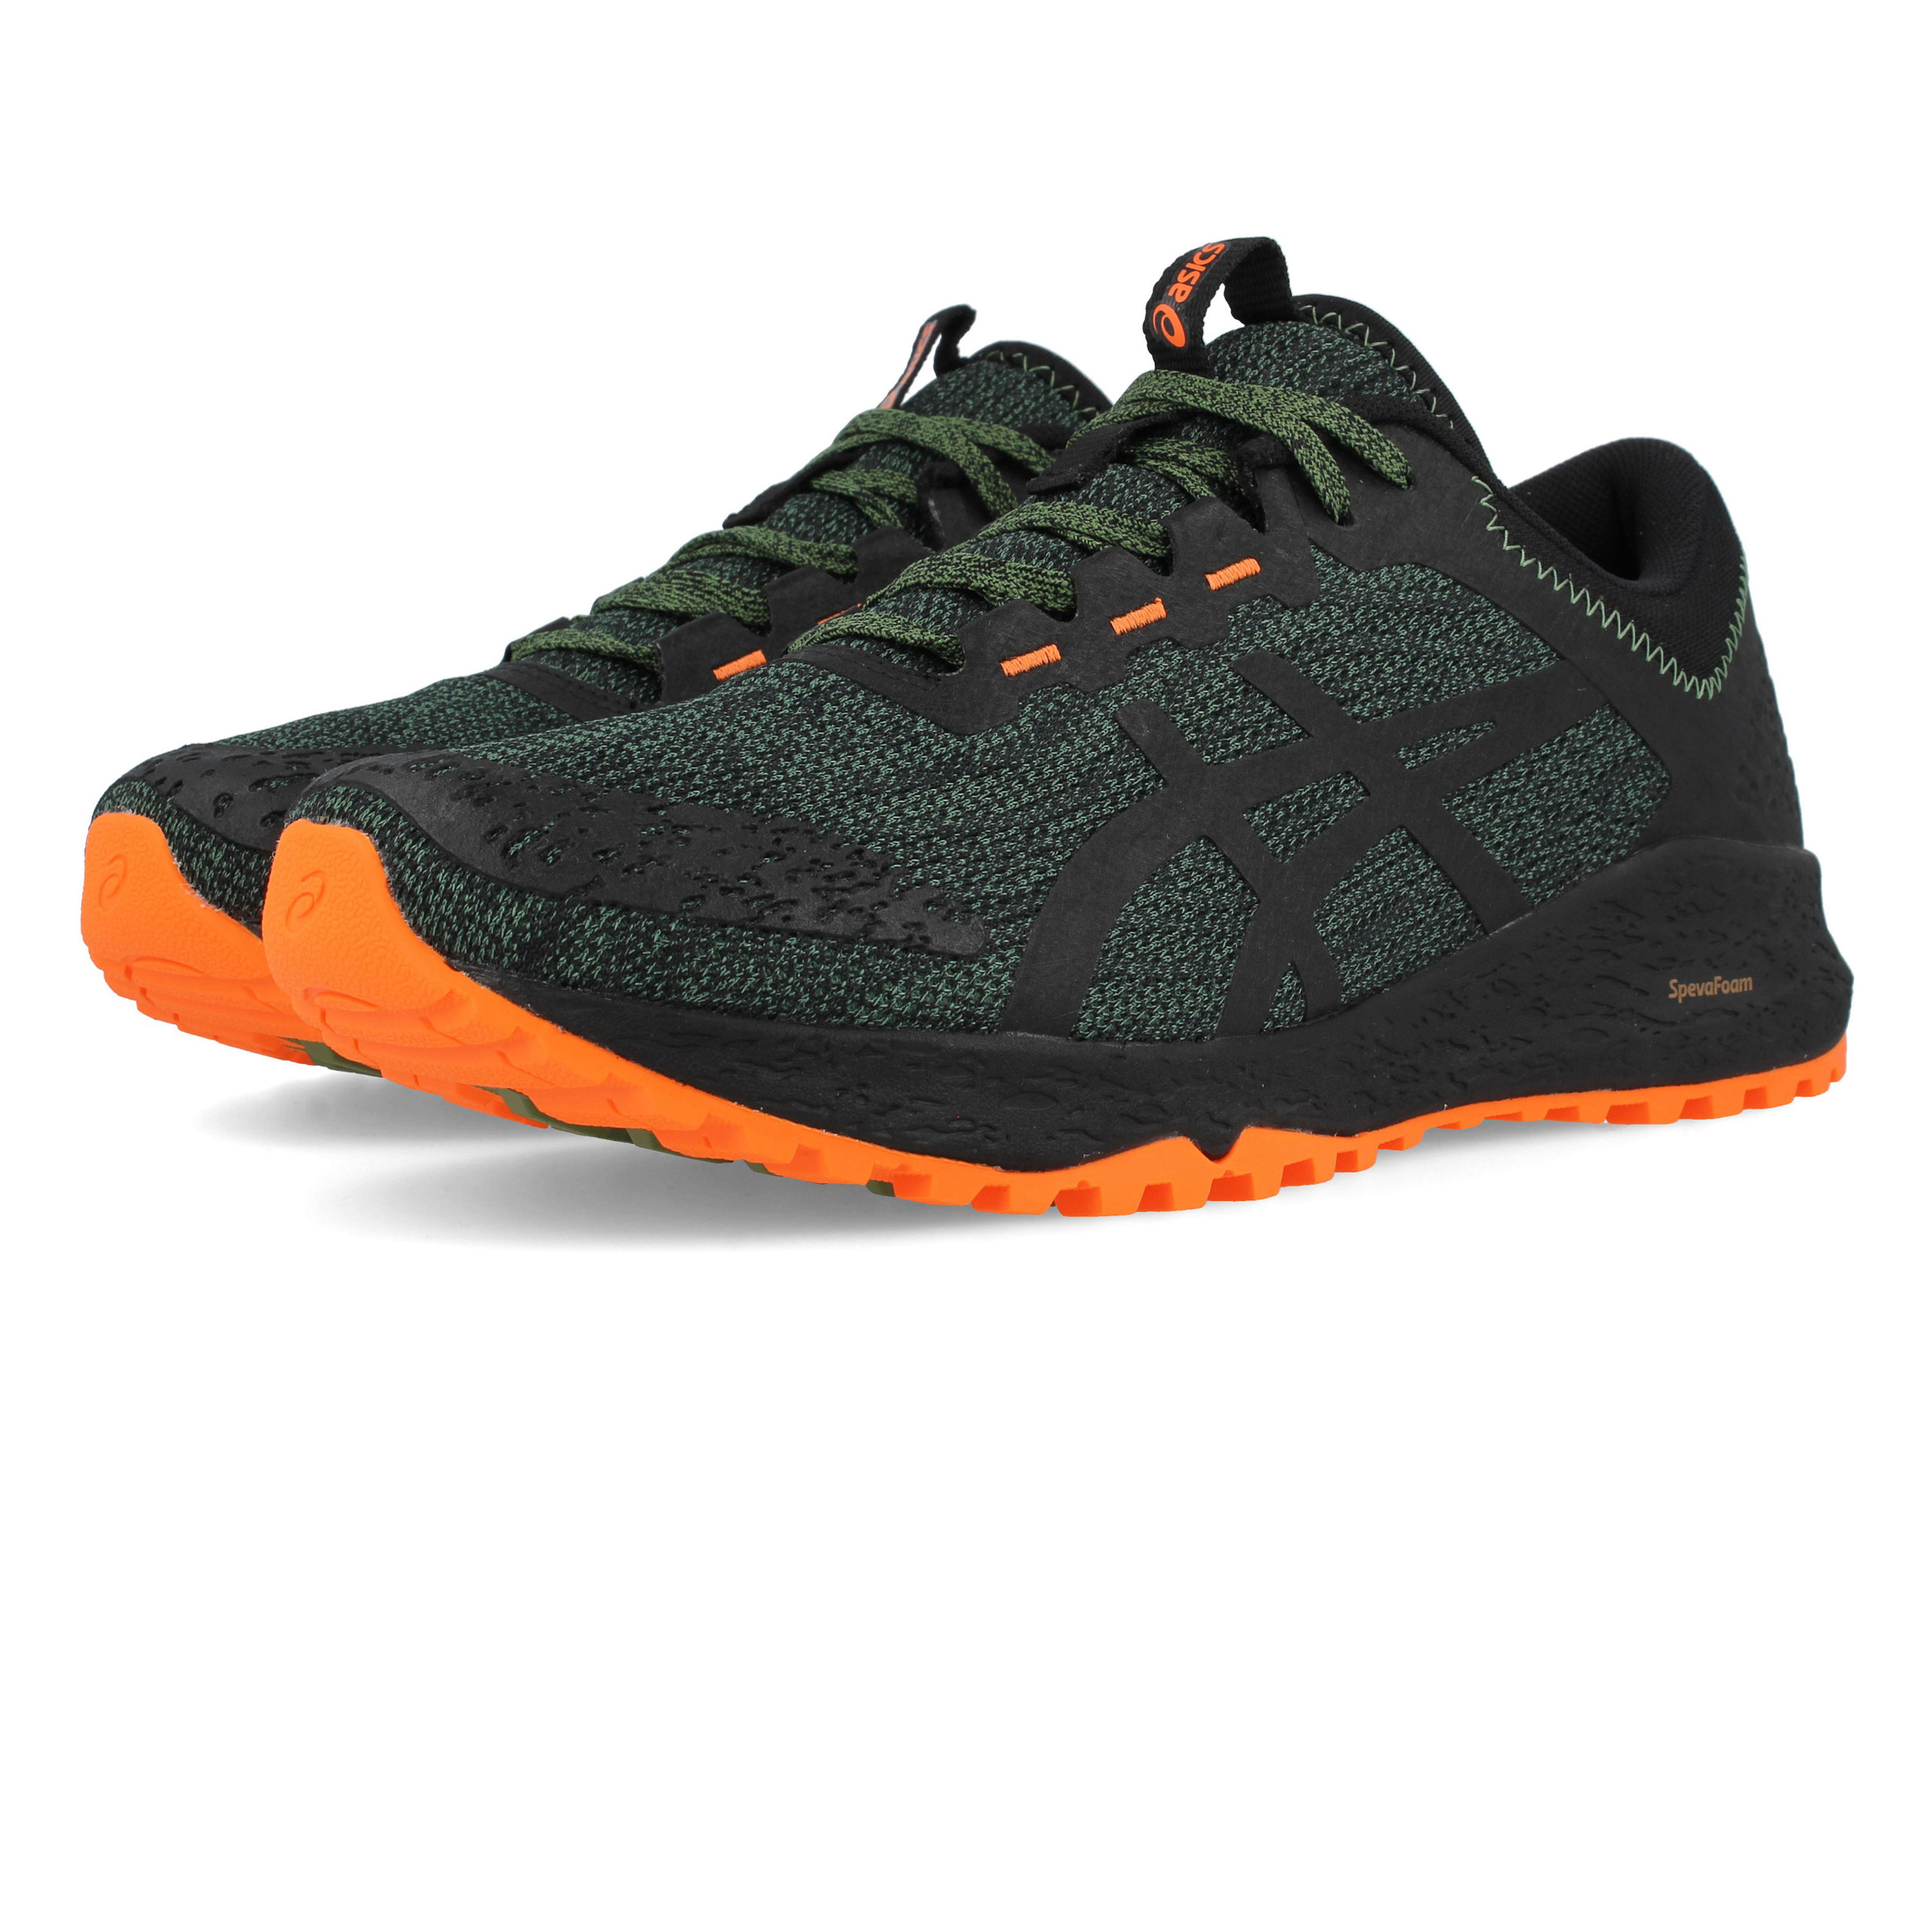 f4da6eaf1 Asics Hombre Alpine Xt Sendero Correr Zapatos Zapatillas Negro Verde Deporte